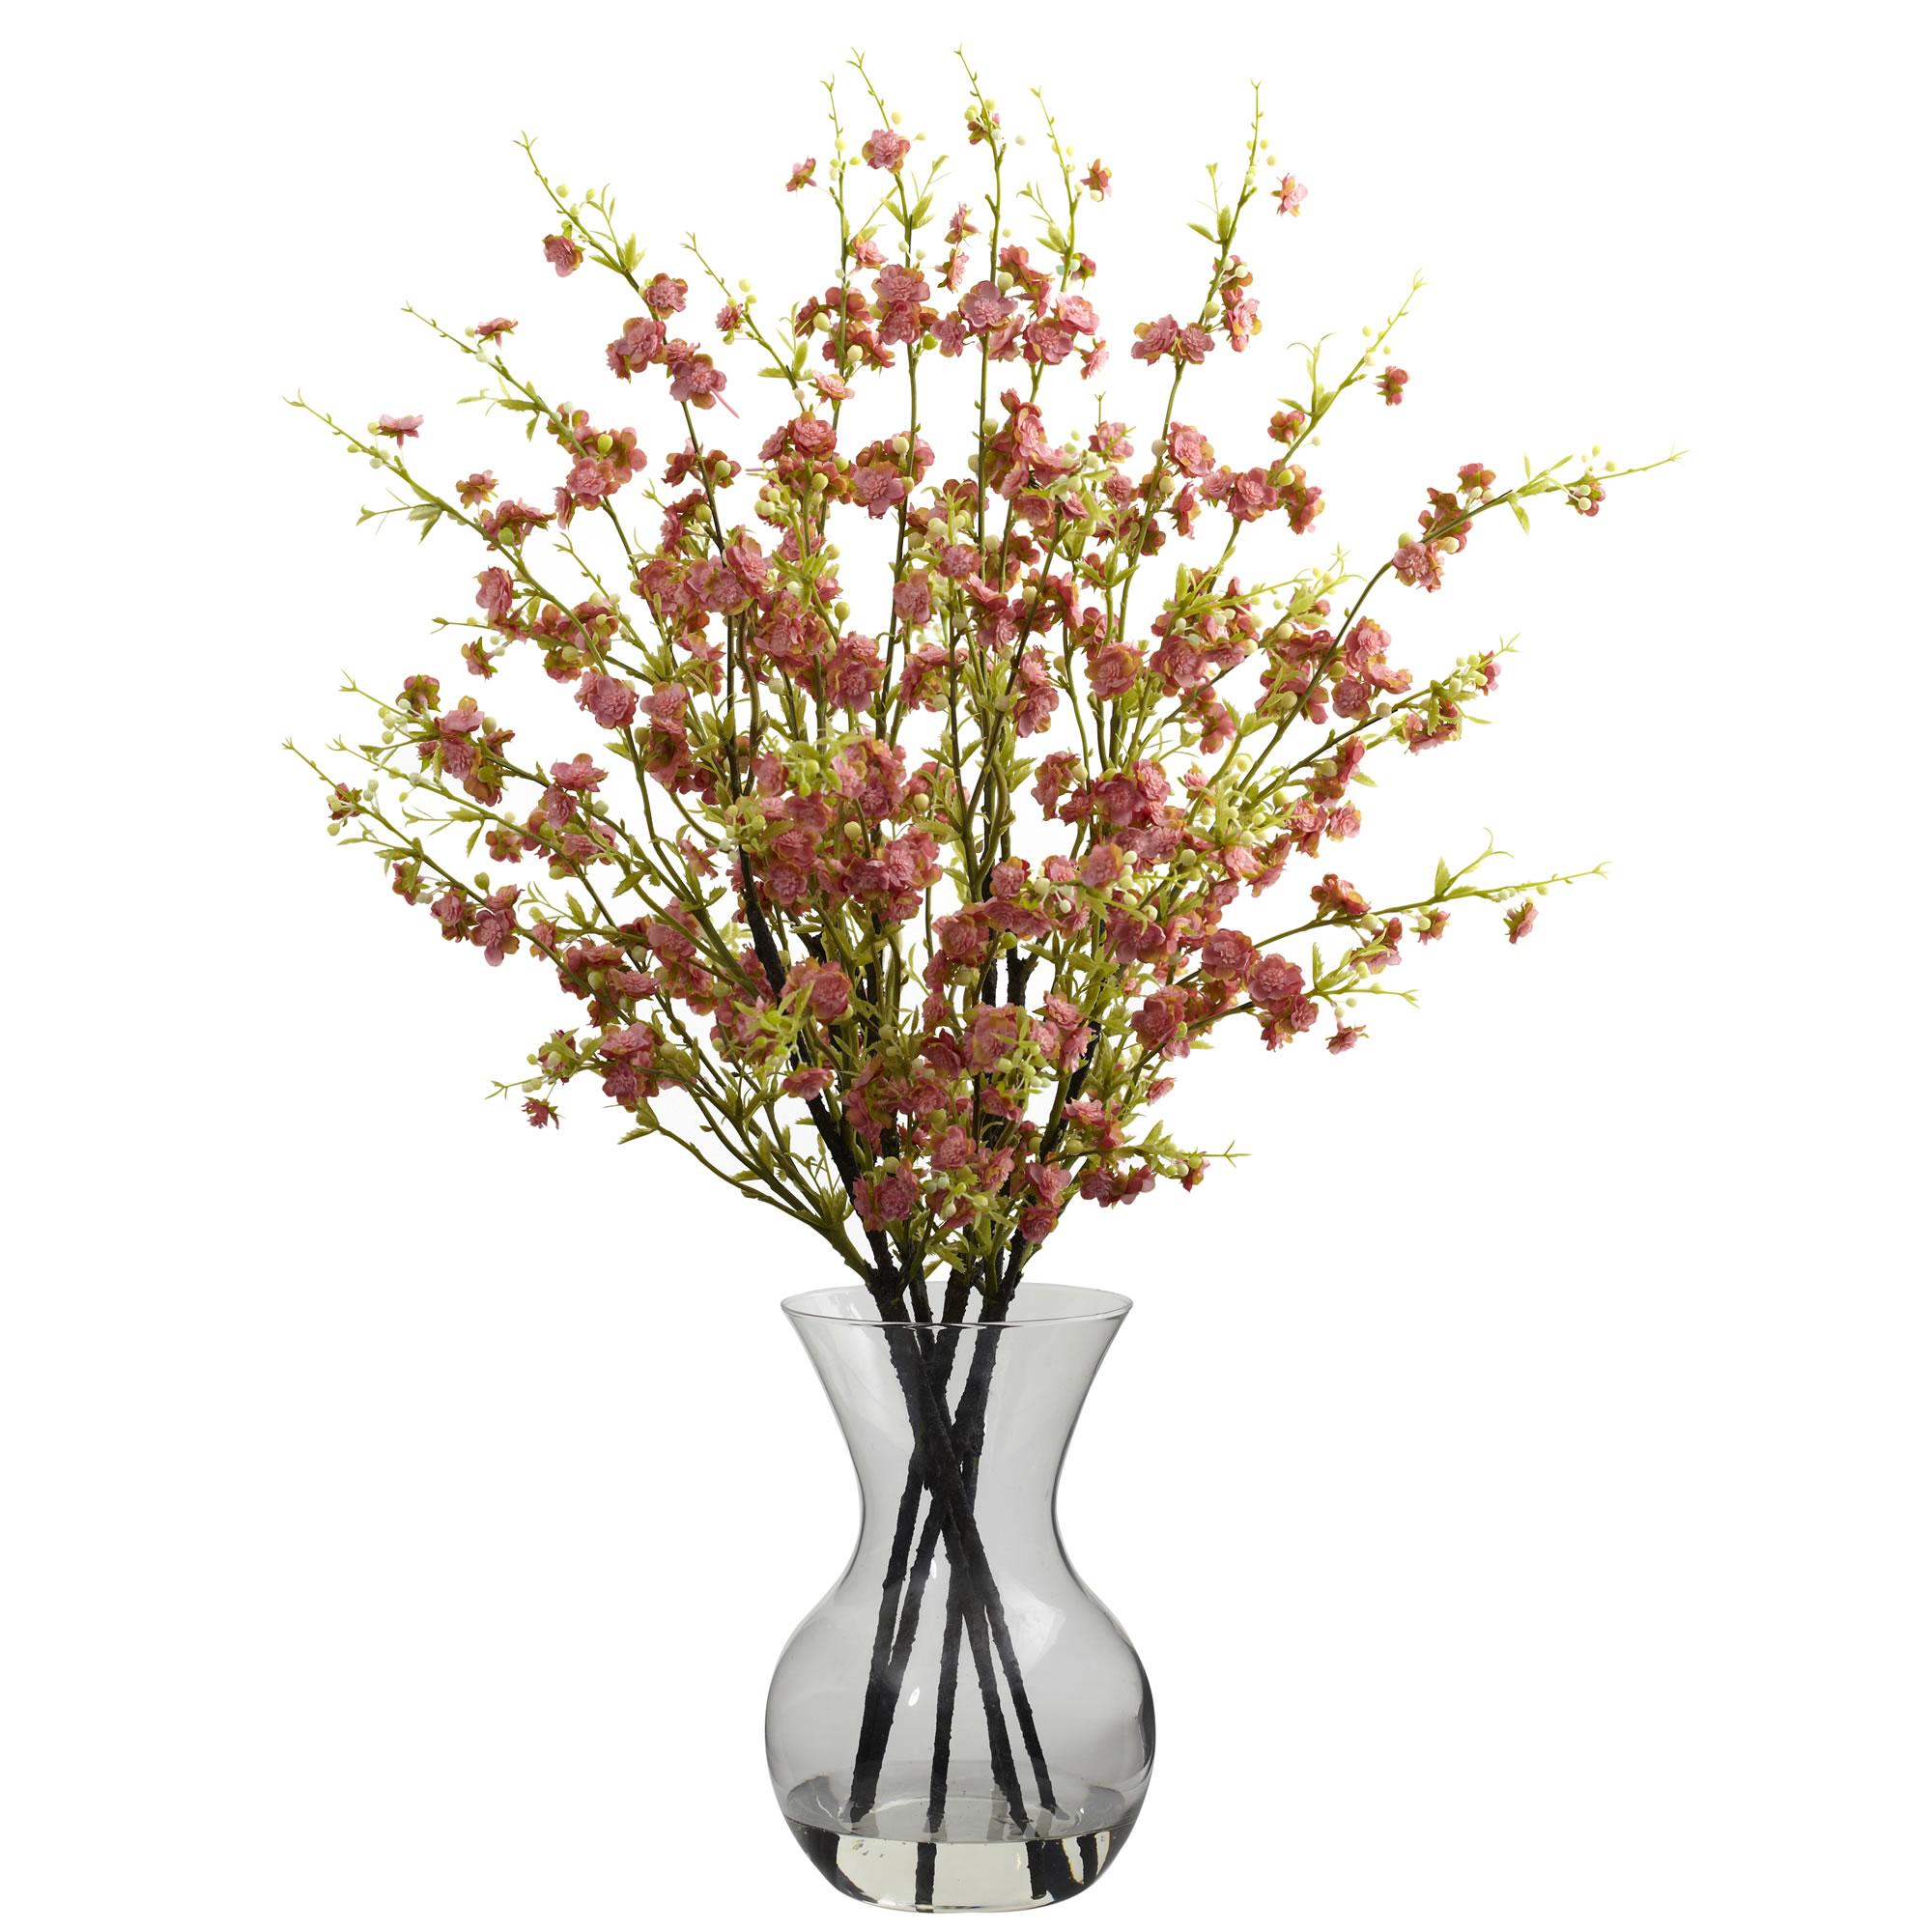 Silk Arrangements For Home Decor Artichoke Topiary Silk Flower Arrangement Flowers Ideas